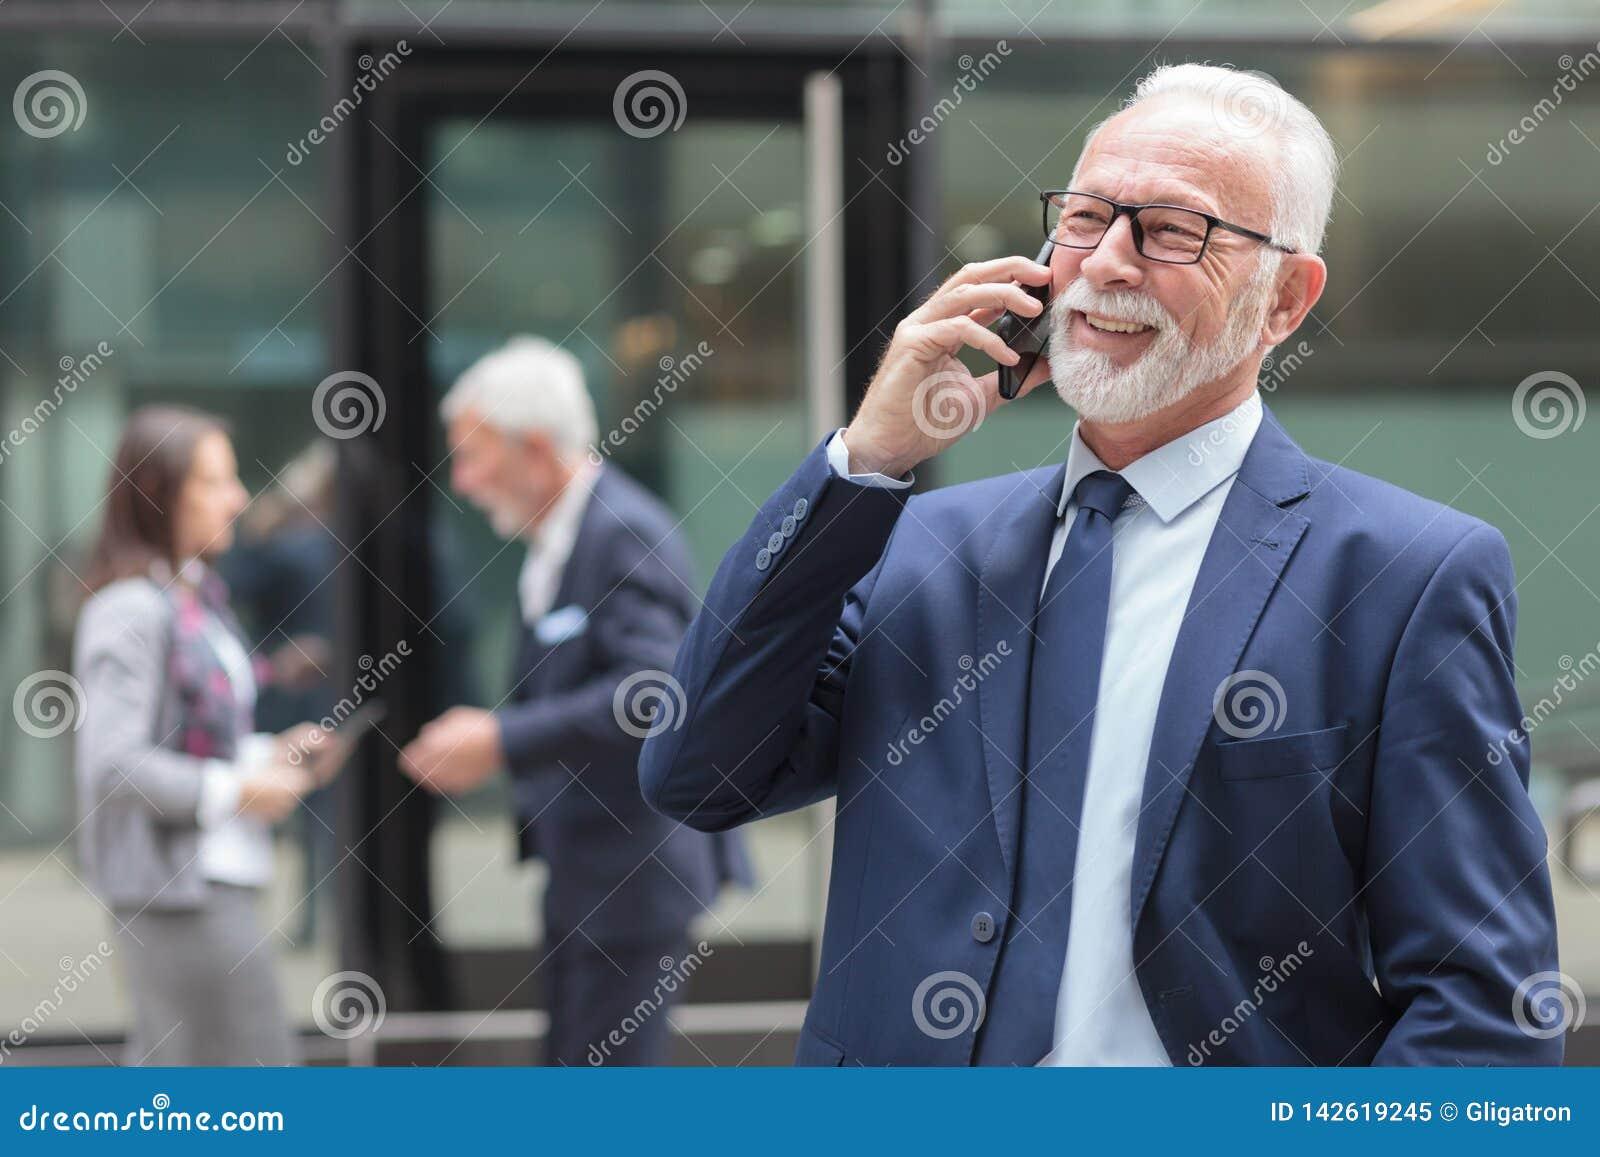 Smiling senior businessman talking on the phone on the street